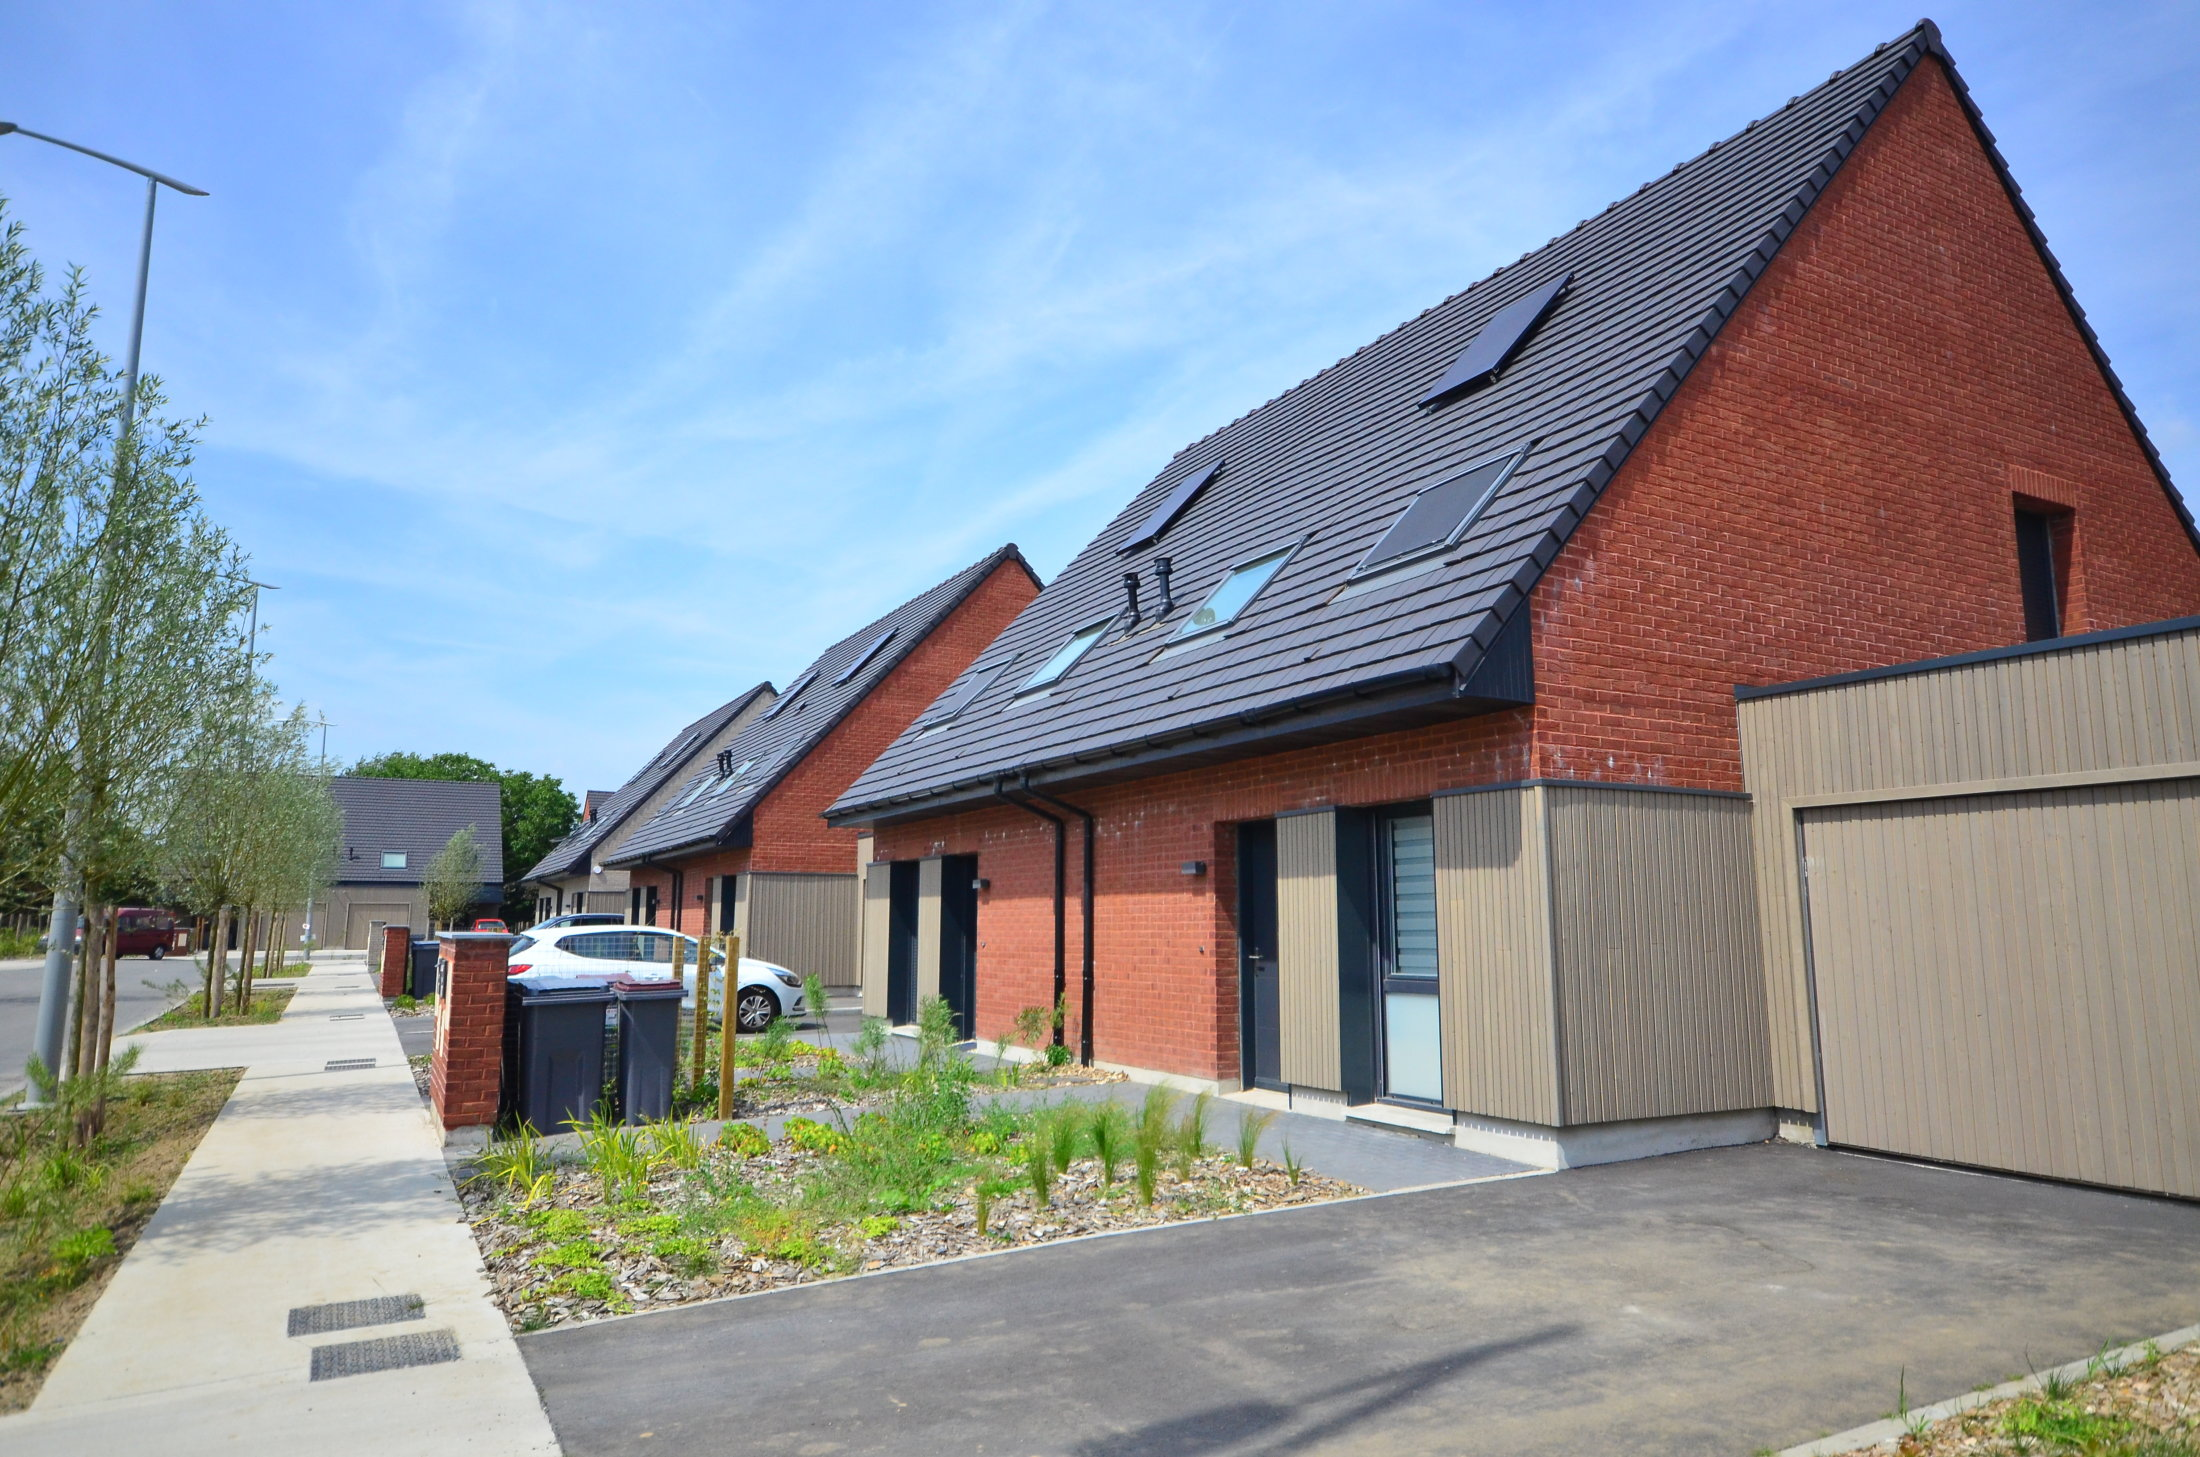 111 logements collectifs et individuels - Wambrechies